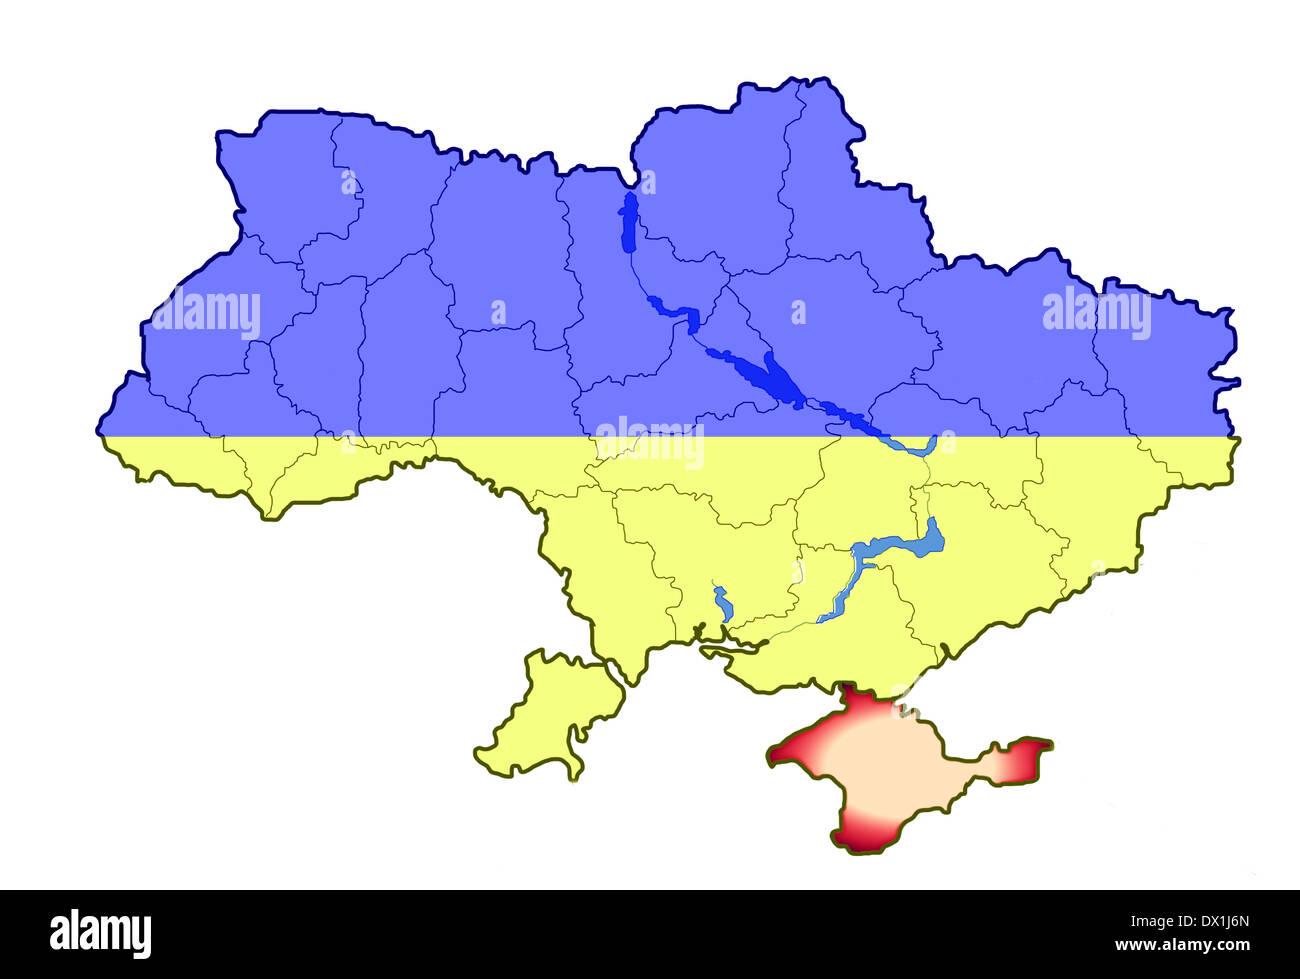 Crimea Peninsula Stock Photos & Crimea Peninsula Stock ... on show map of eastern europe, show map of romania, show map of moscow, show map of georgia, show map of asia minor,